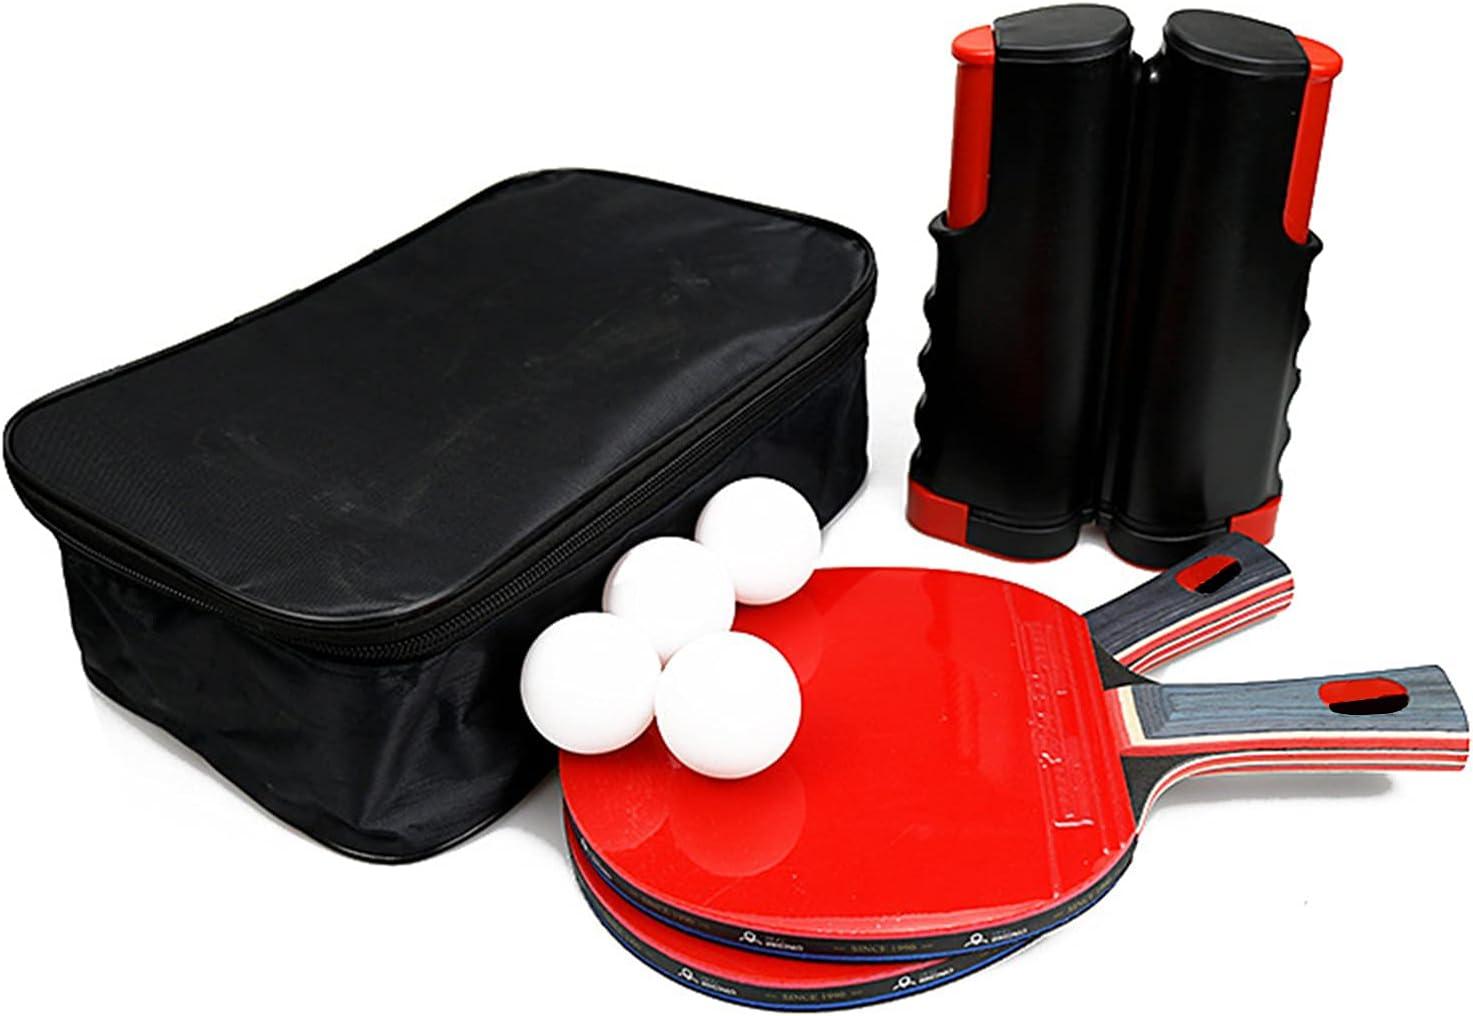 MYRCLMY Beginner Family Racket, Tiro Horizontal, Portable Ping Pong Racket Set Tabla Blade De 2 Handle Ping Pong Paddles + 1 Red Retráctil + 4 Pelotas De Tenis De Mesa